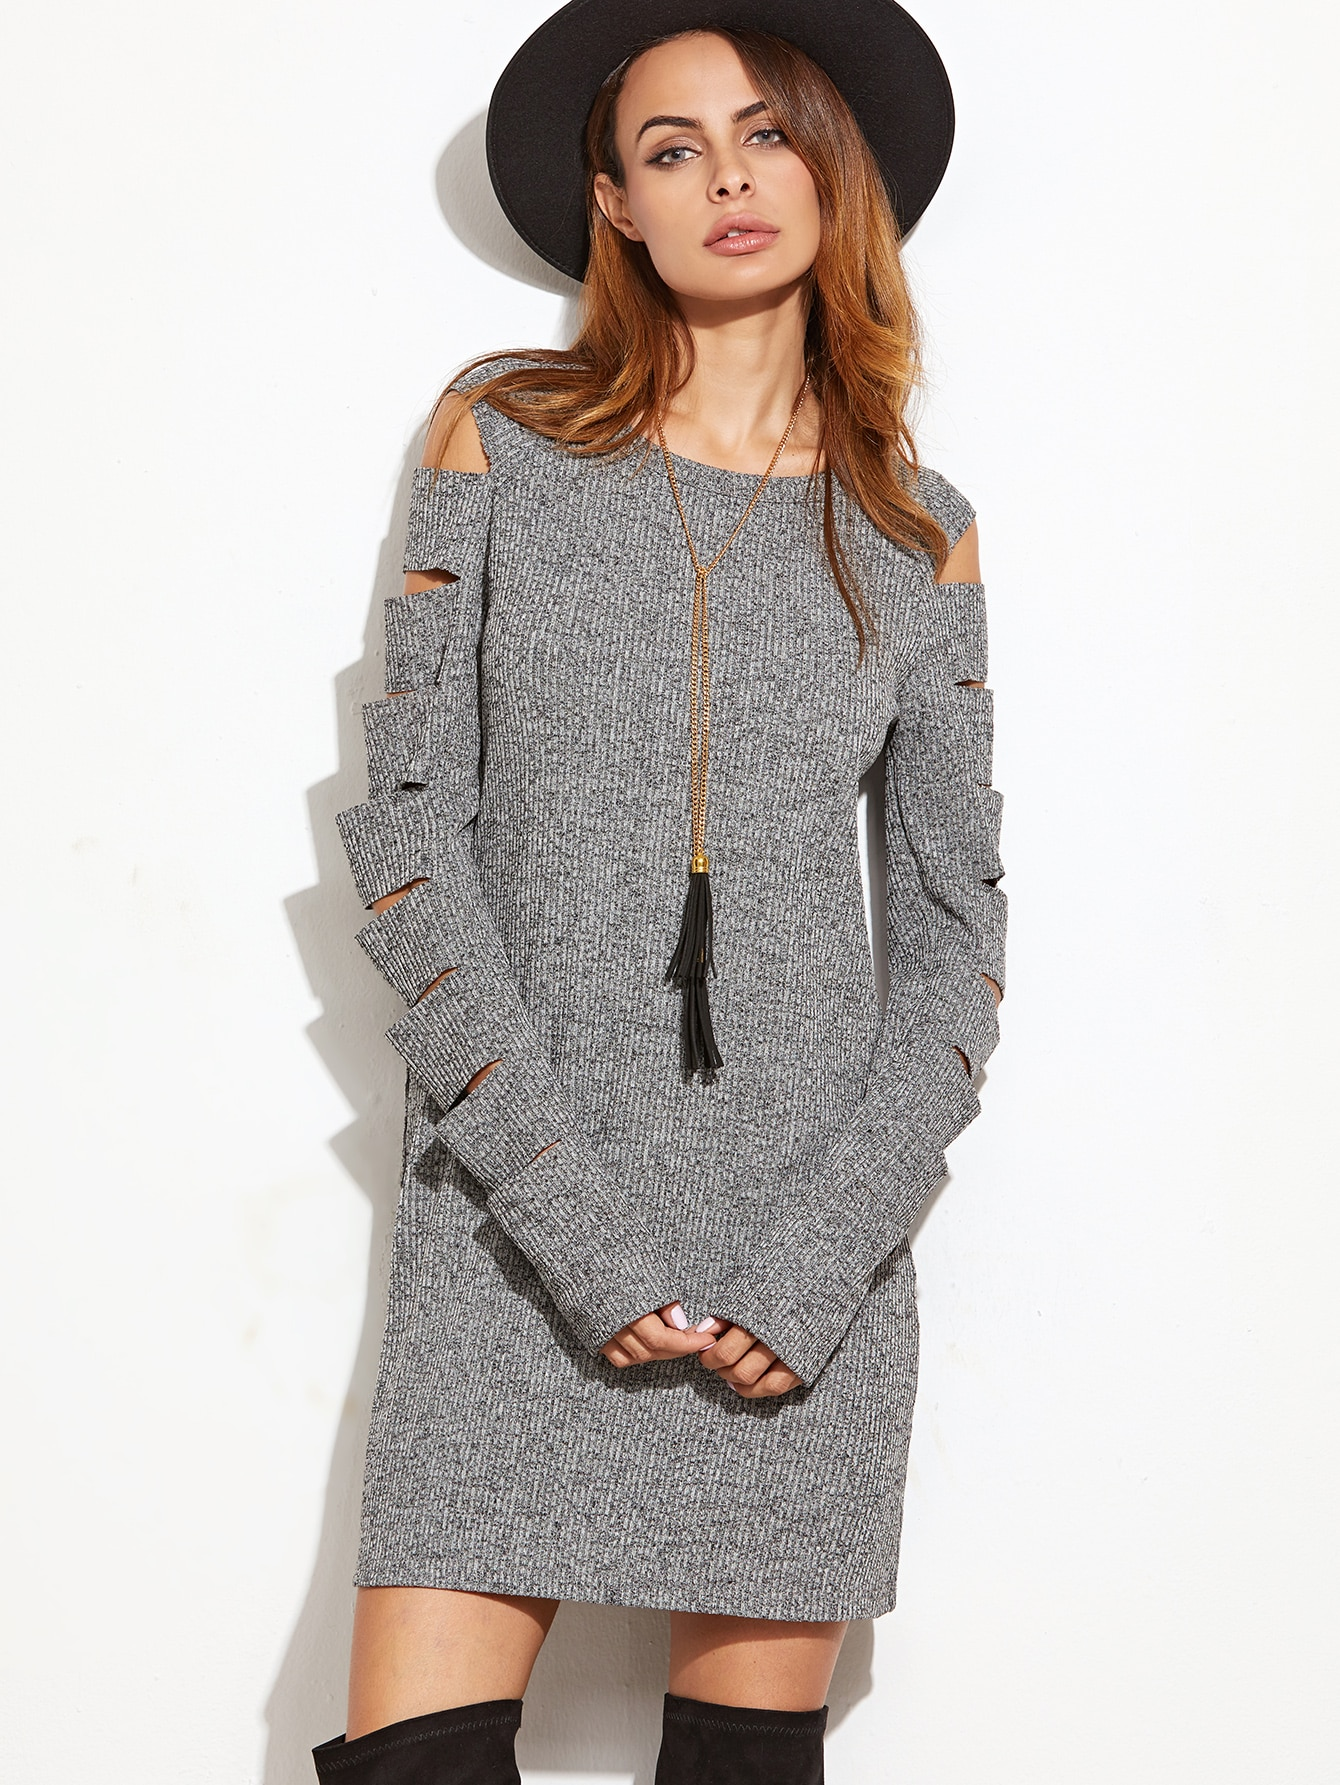 Grey Marled Ribbed Knit Ladder Cutout Sleeve Dress dress161110707